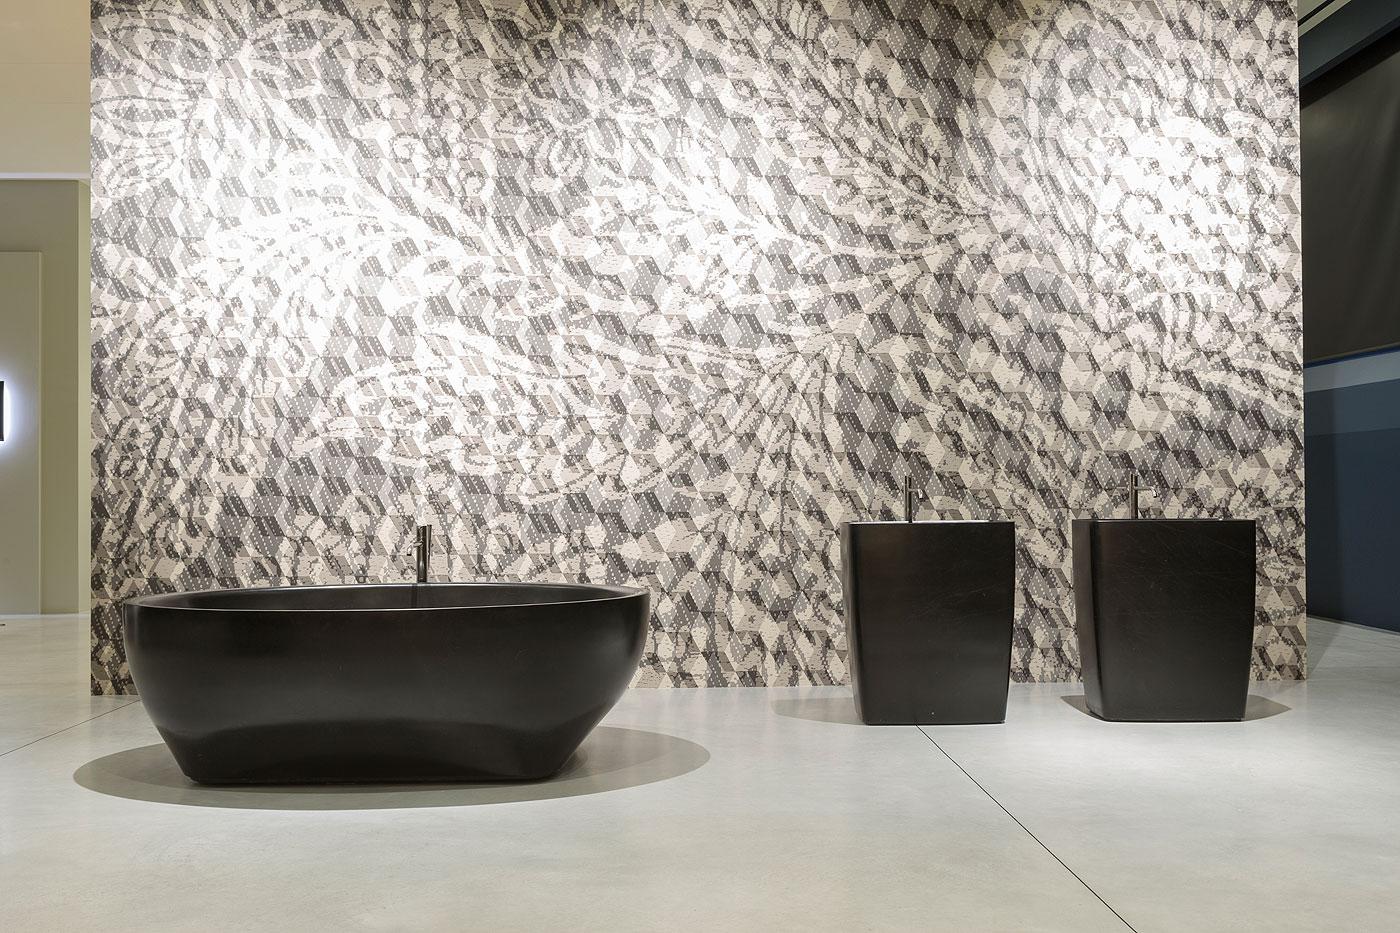 showroom-corporativo-antoniolupi-stabbia (11)